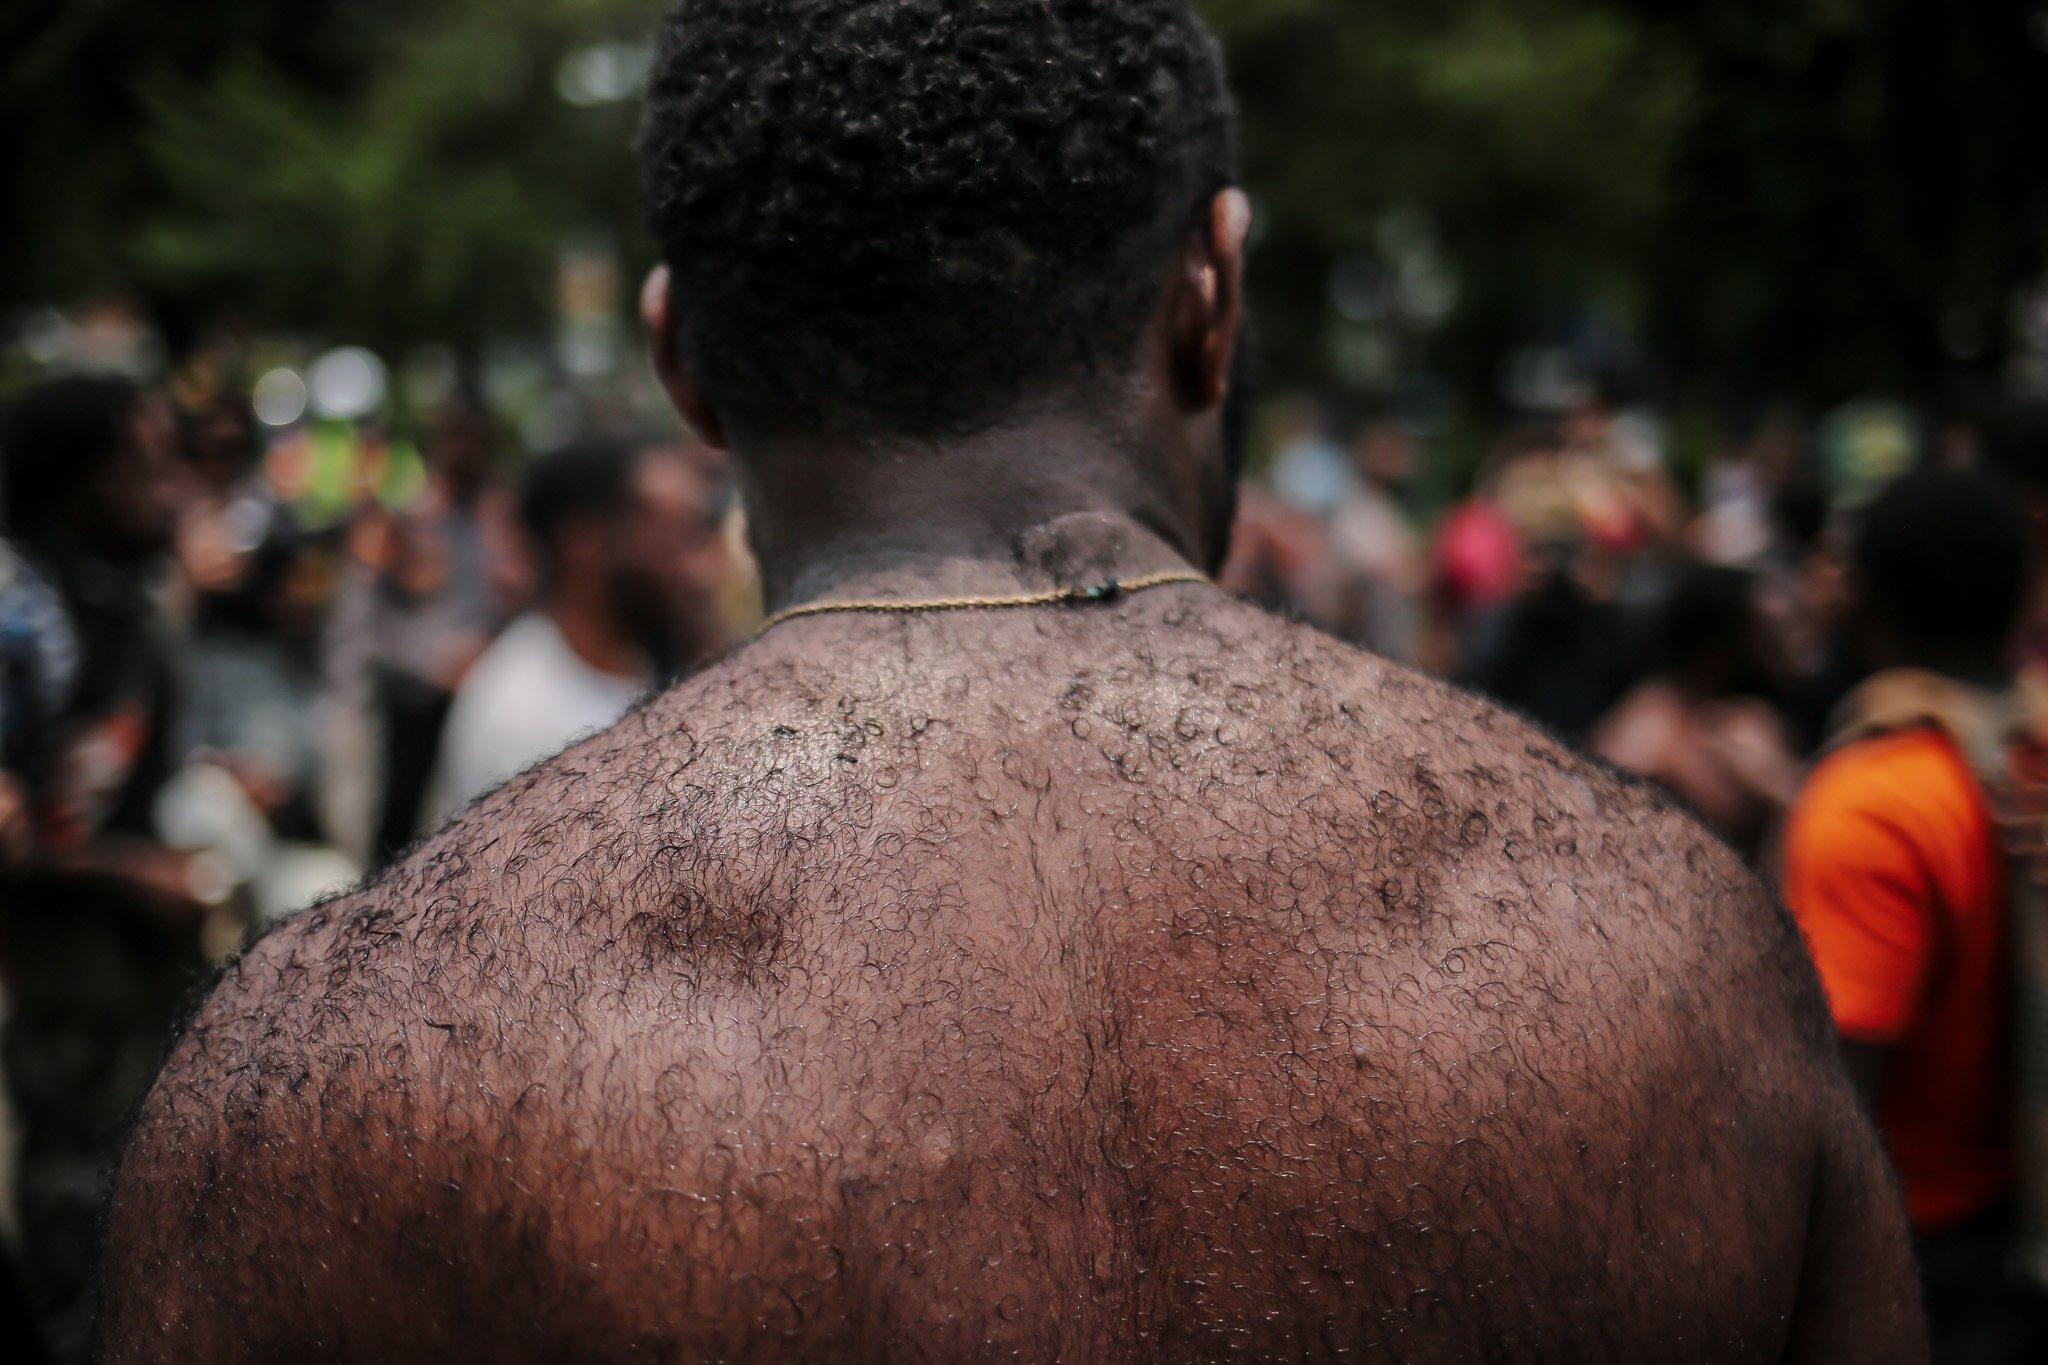 Sejumlah pengunjuk rasa yang tergabung dalam Aliansi Mahasiswa Papua (AMP) membuka baju saat diamankan pihak kepolisian pada aksi unjuk rasa peringatan Roma Agreement ke-59 di Depan Kedutaan Amerika Serikat, Jakarta, Kamis, (30/9/2021).